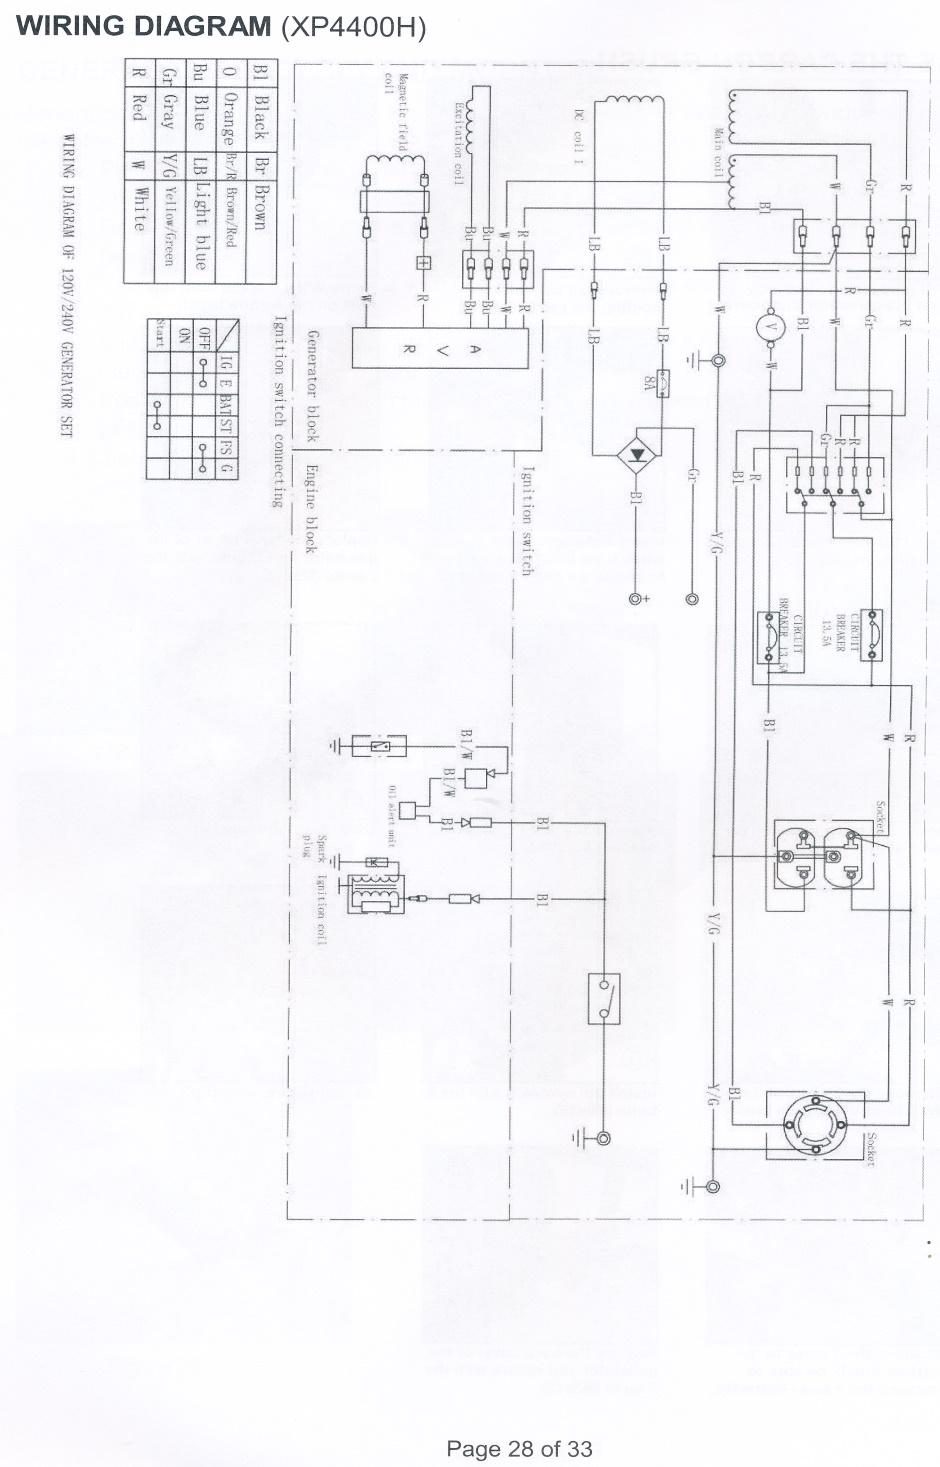 Champion Thermostat Wiring Diagram - 220 Volt House Wiring Diagram for Wiring  Diagram Schematics | 1981 Champion Wiring Diagram |  | Wiring Diagram Schematics